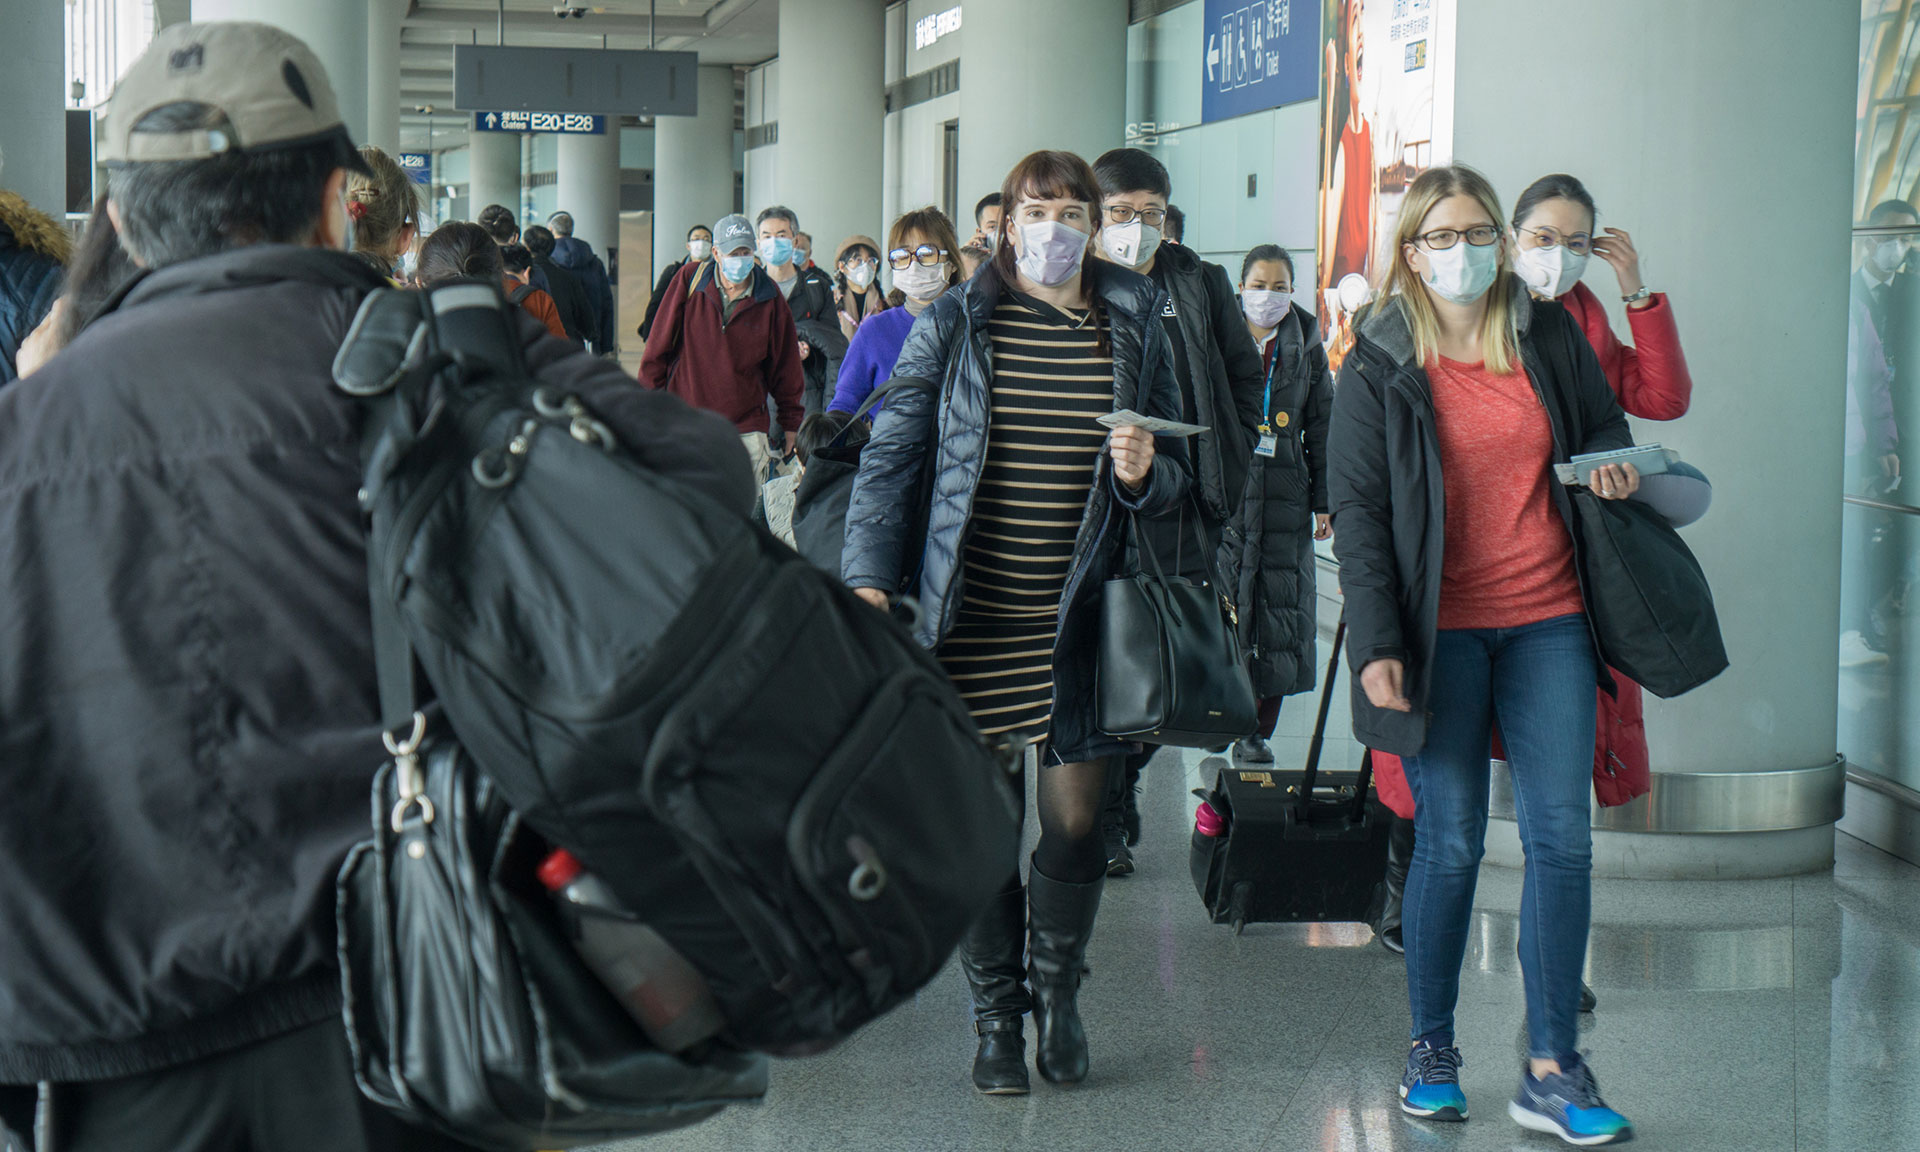 Coronavirus outbreak Q&A: advice for travellers